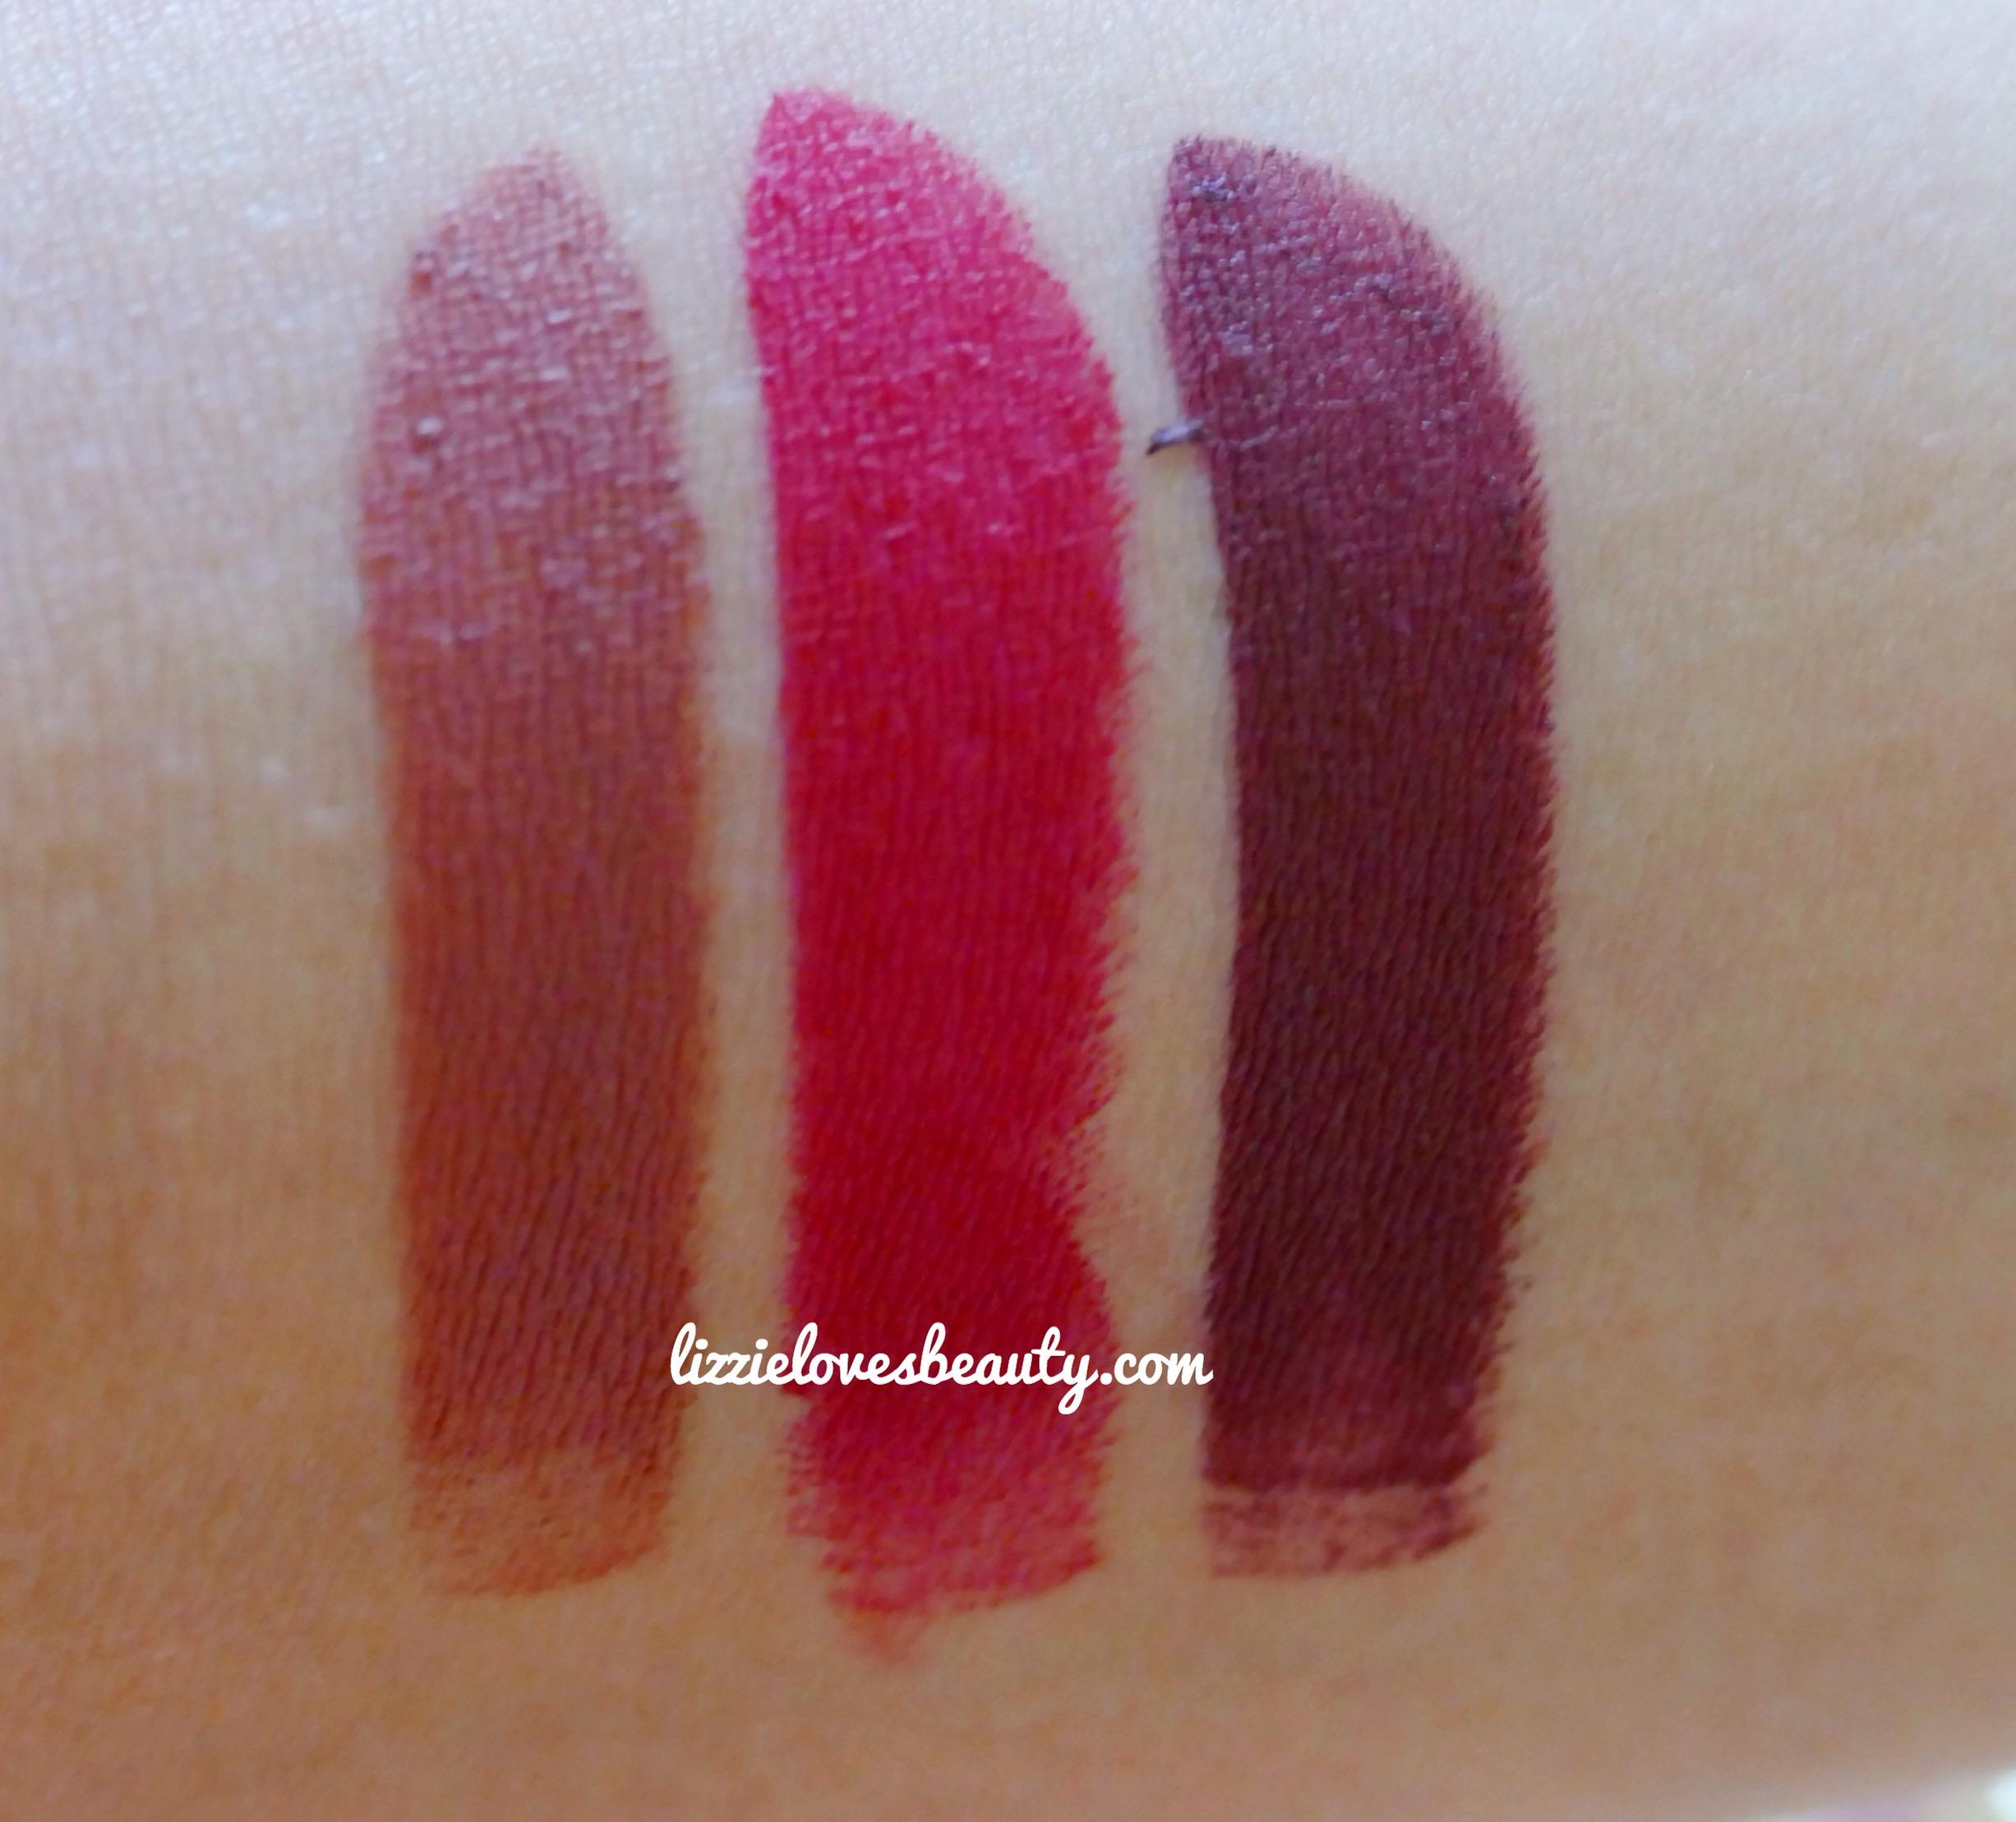 Color Sensational Creamy Matte Lipstick by Maybelline #13